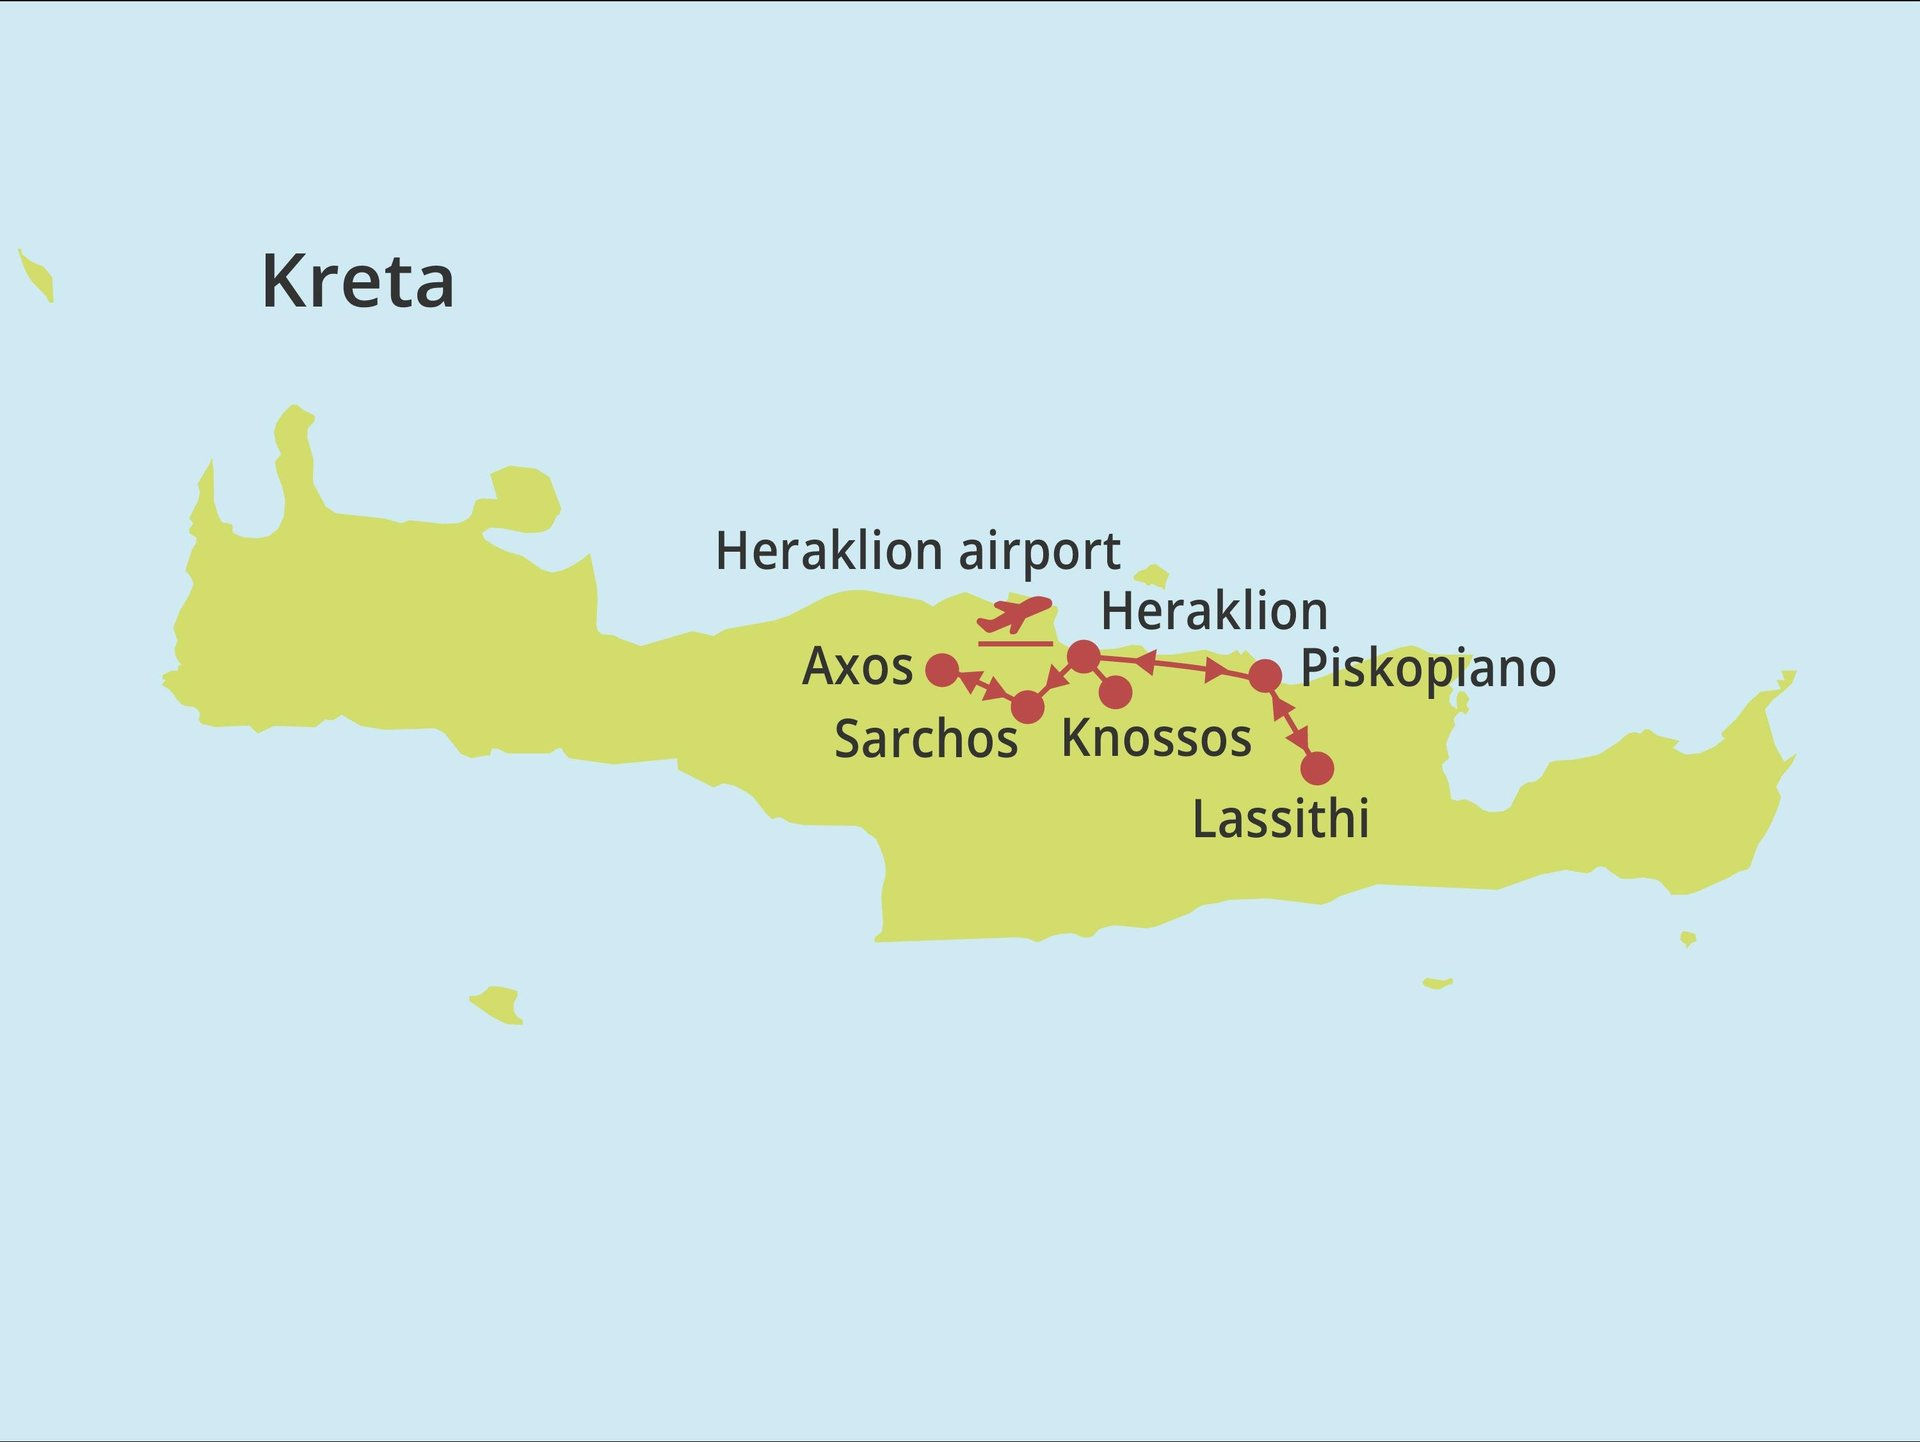 Fly-drive Kreta - Couleur Locale